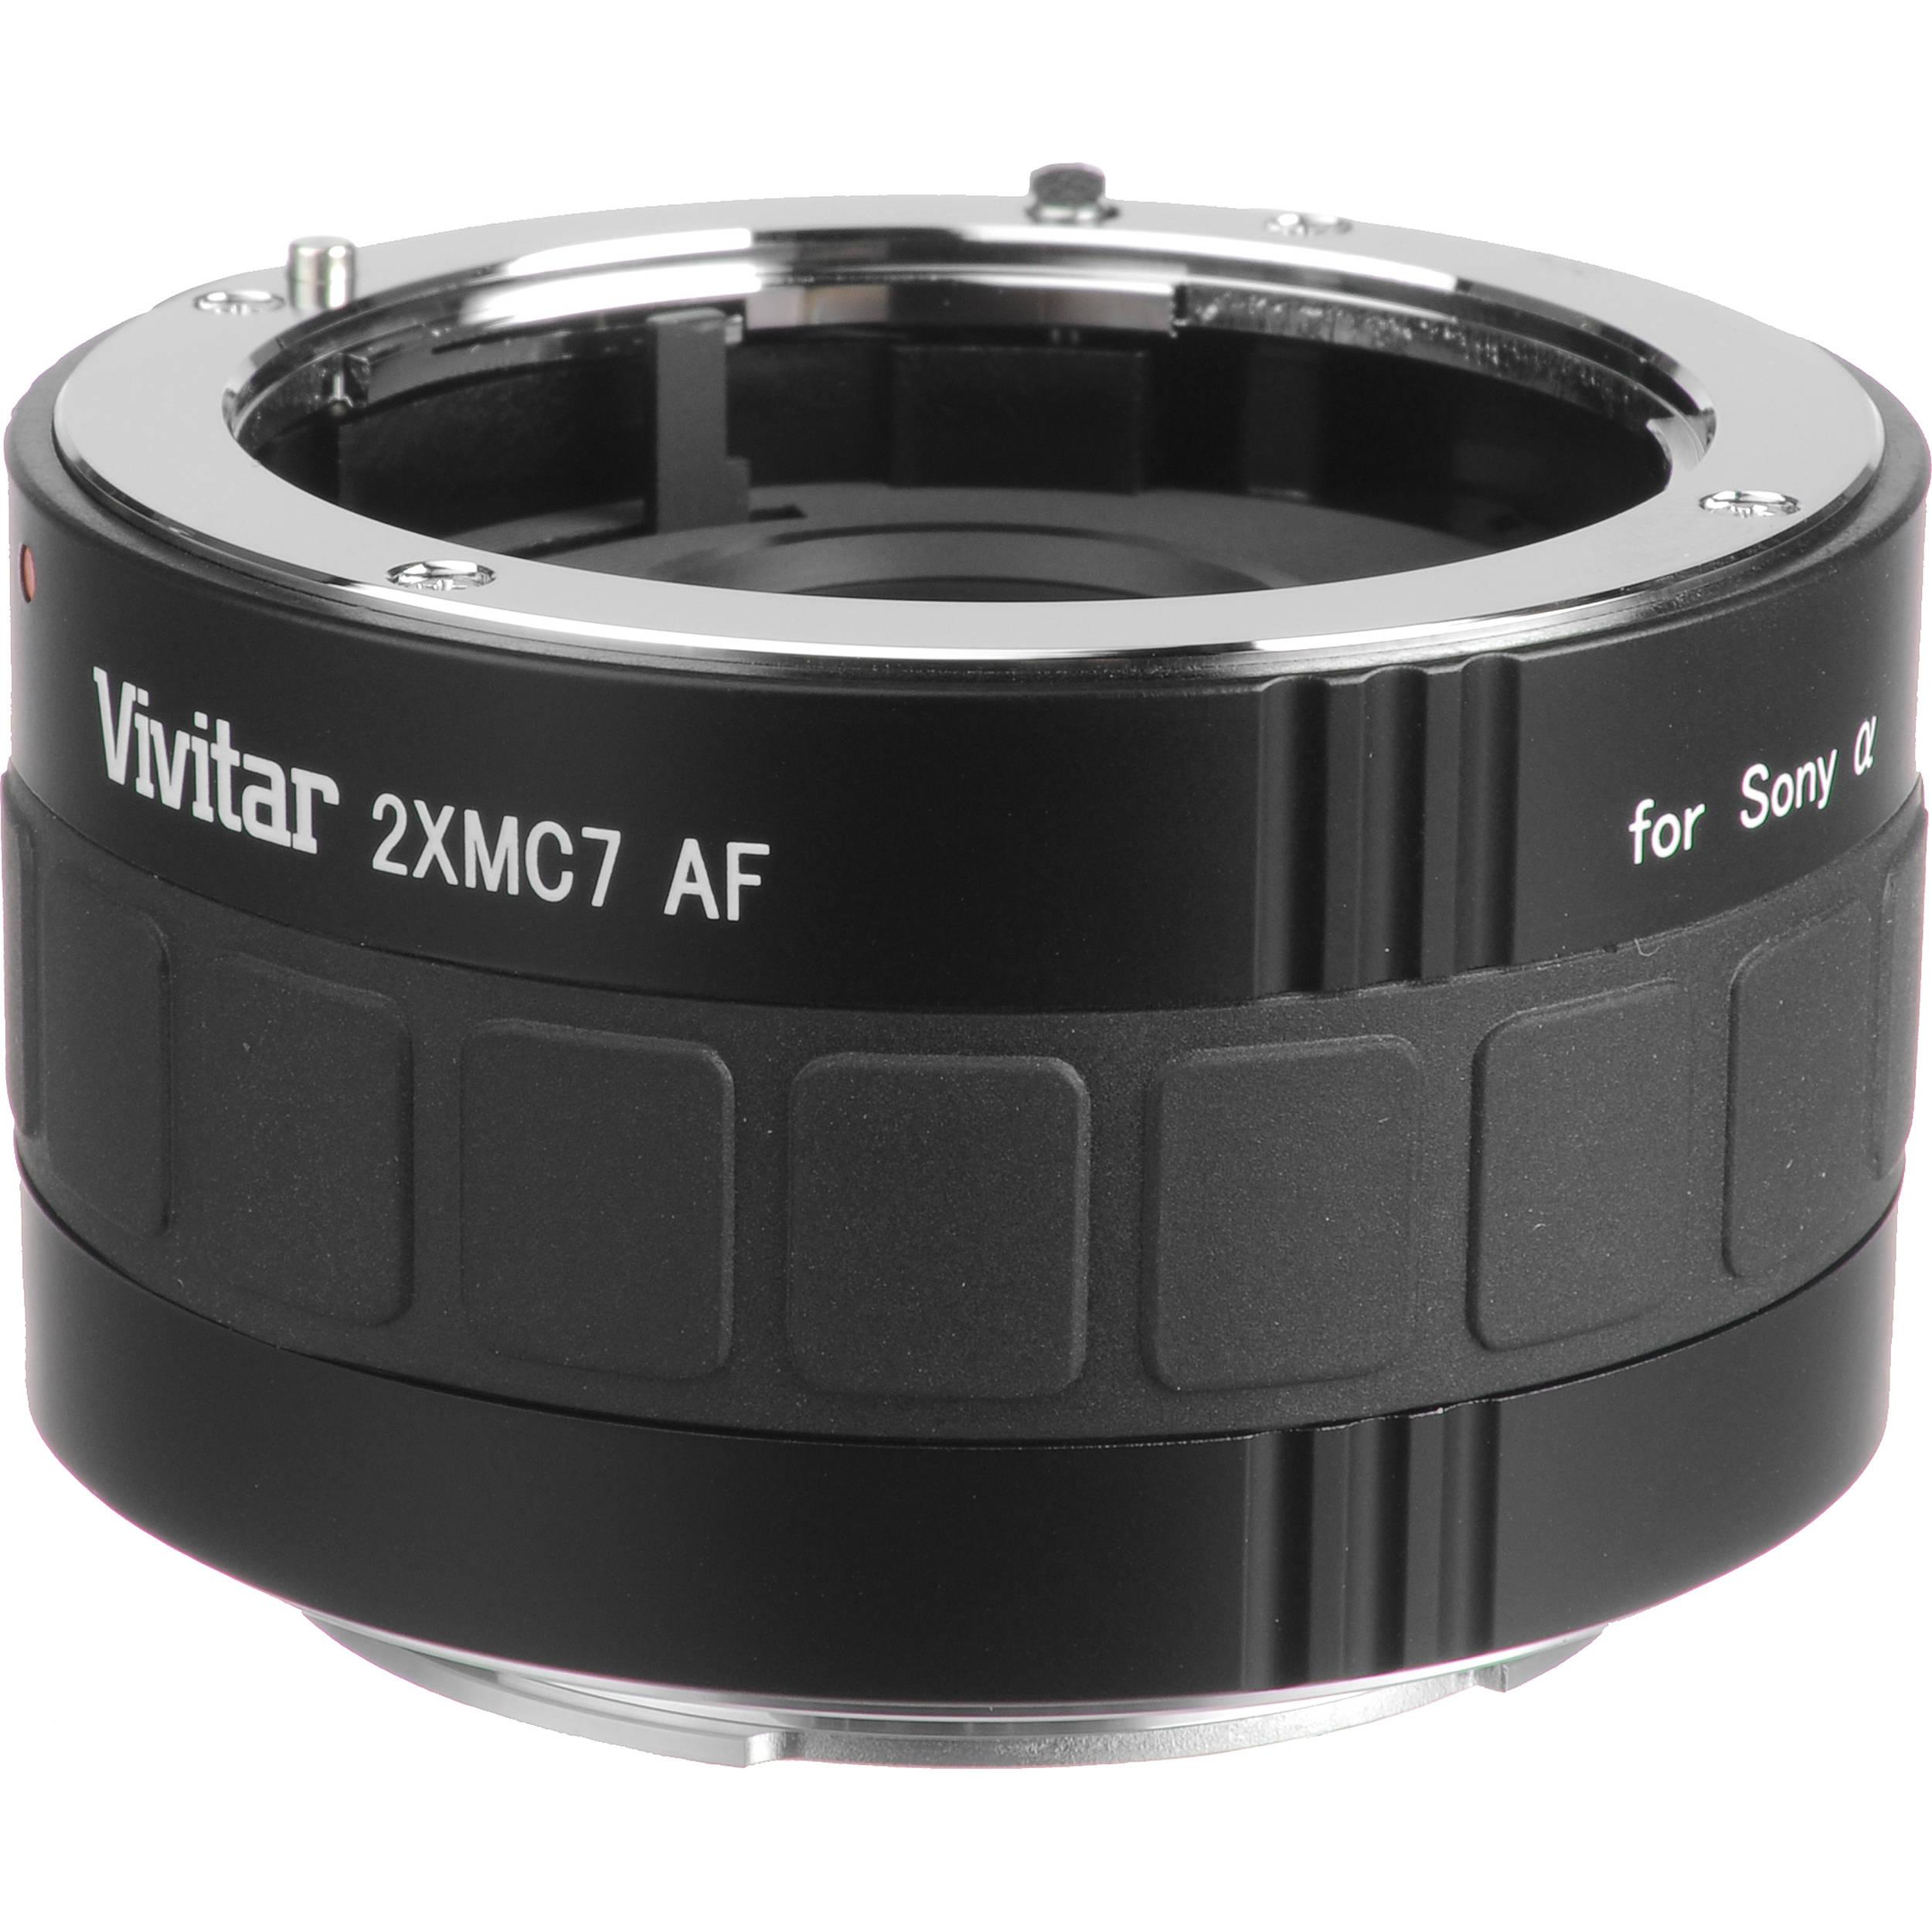 Vivitar Series 1 Teleconverter For Sony/Minolta VIV-2X7-S B&H